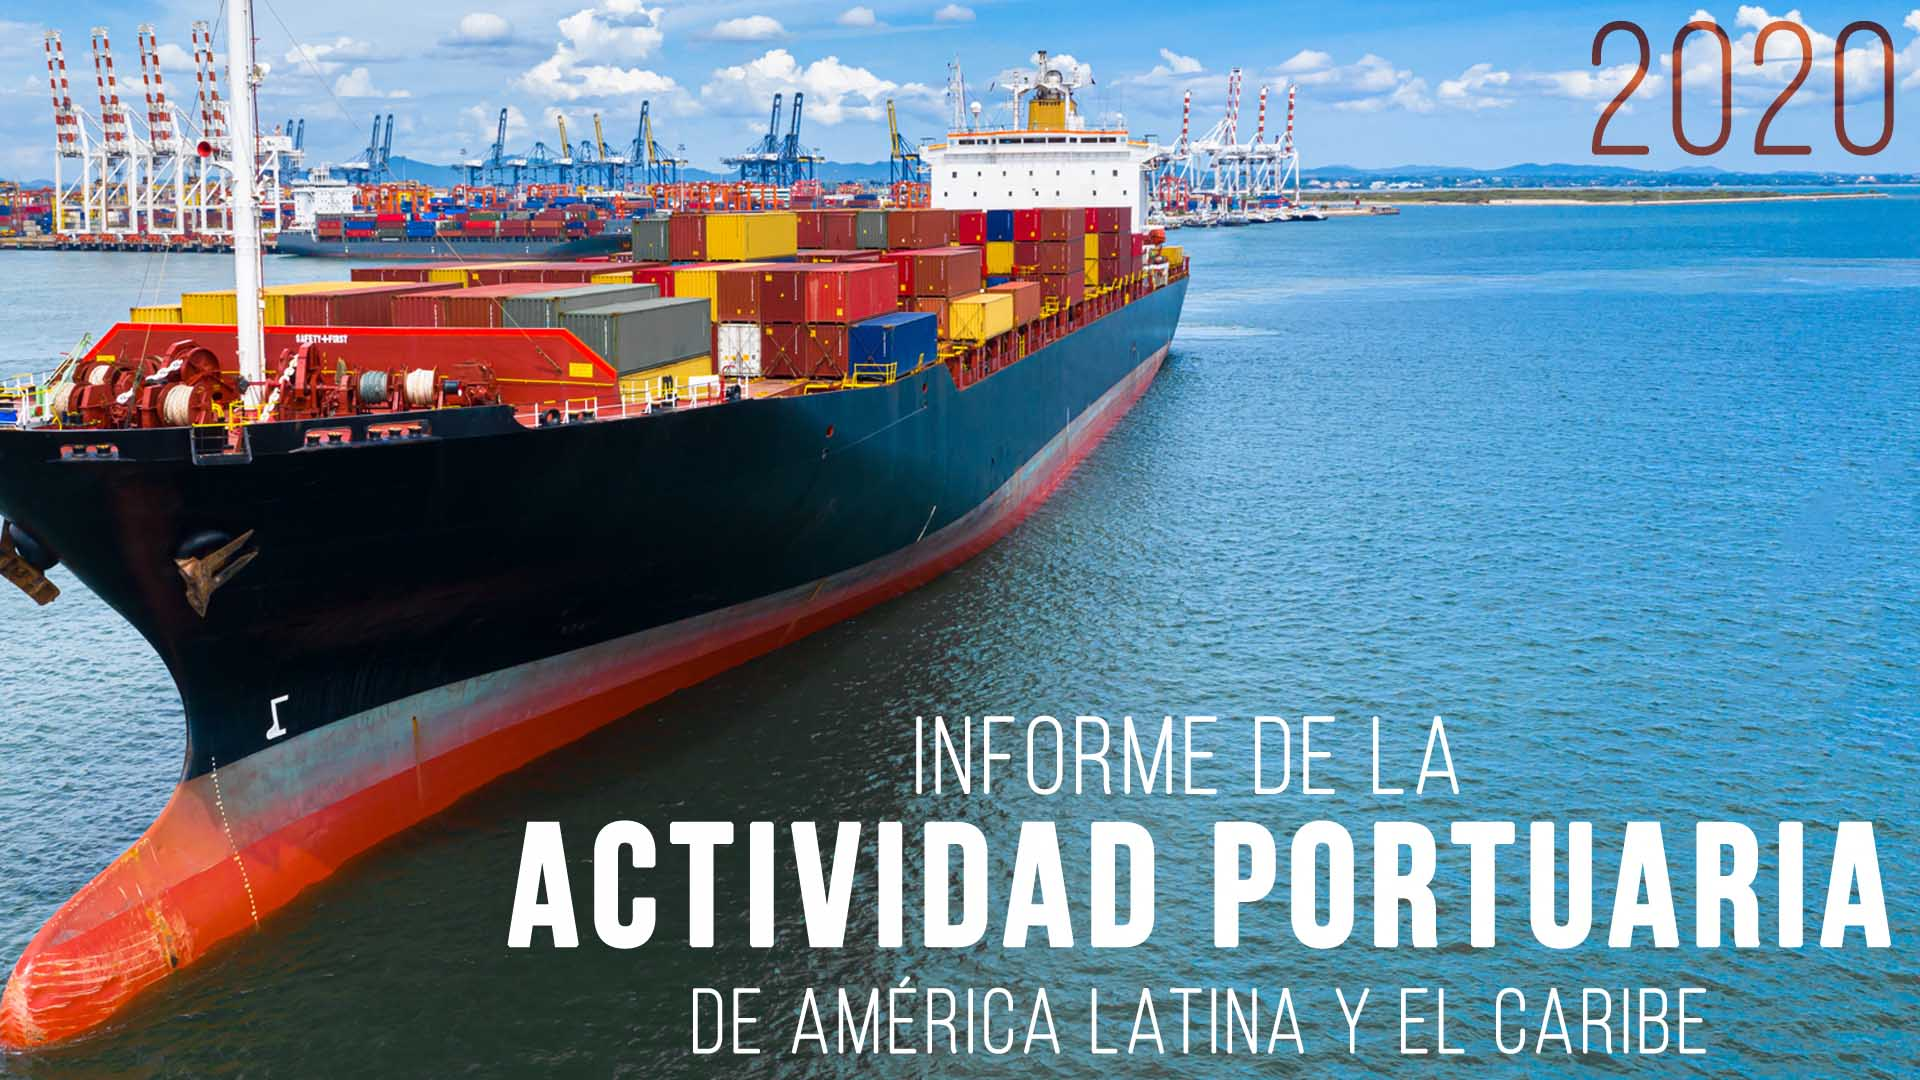 Portada informe portuario 2020